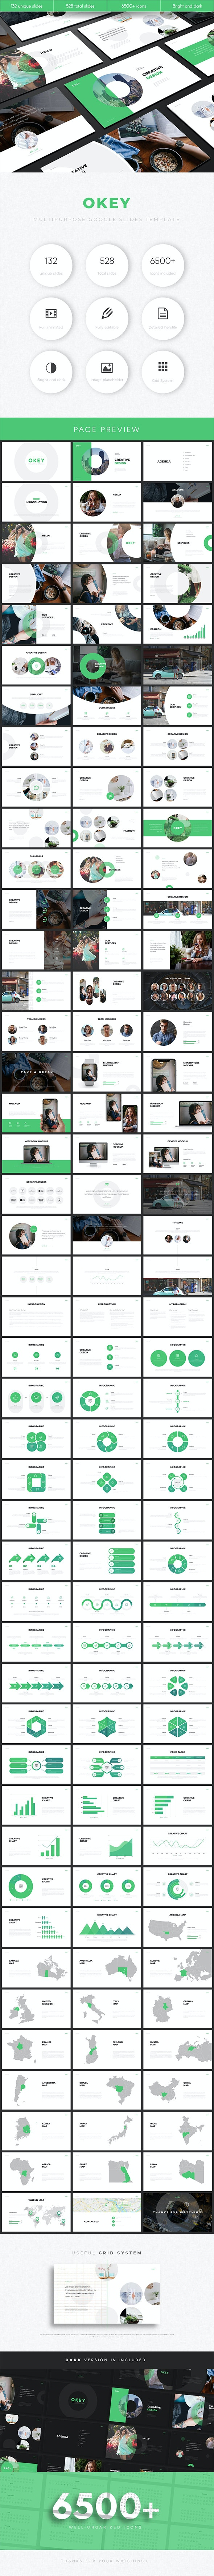 Okey Multipurpose Google Slides Template - Google Slides Presentation Templates